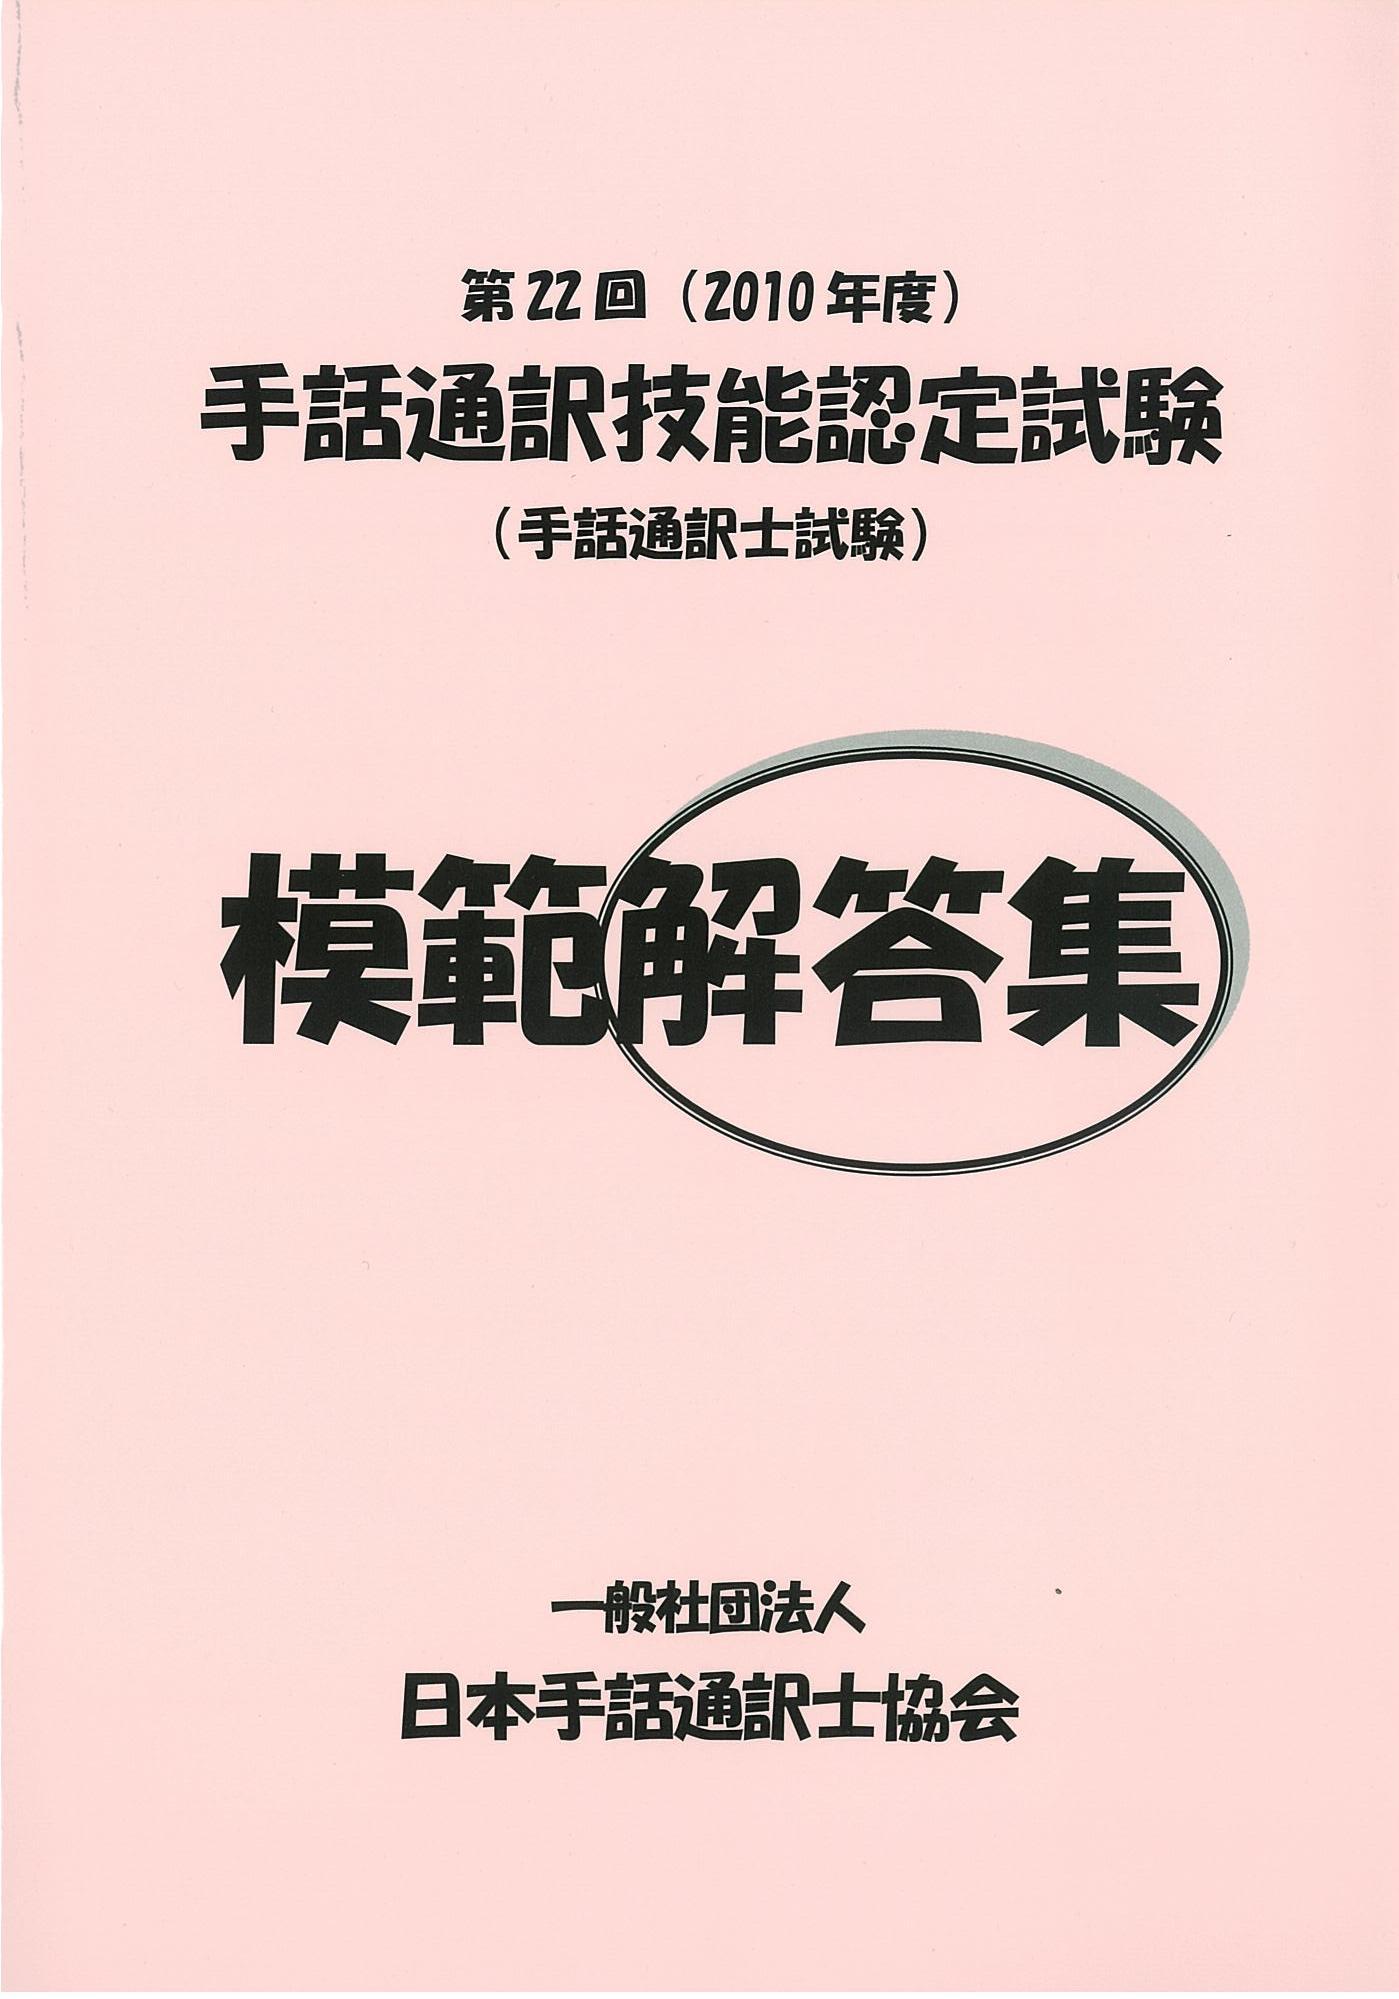 H22手話通訳技能認定試験(手話通訳士試験)模範解答集